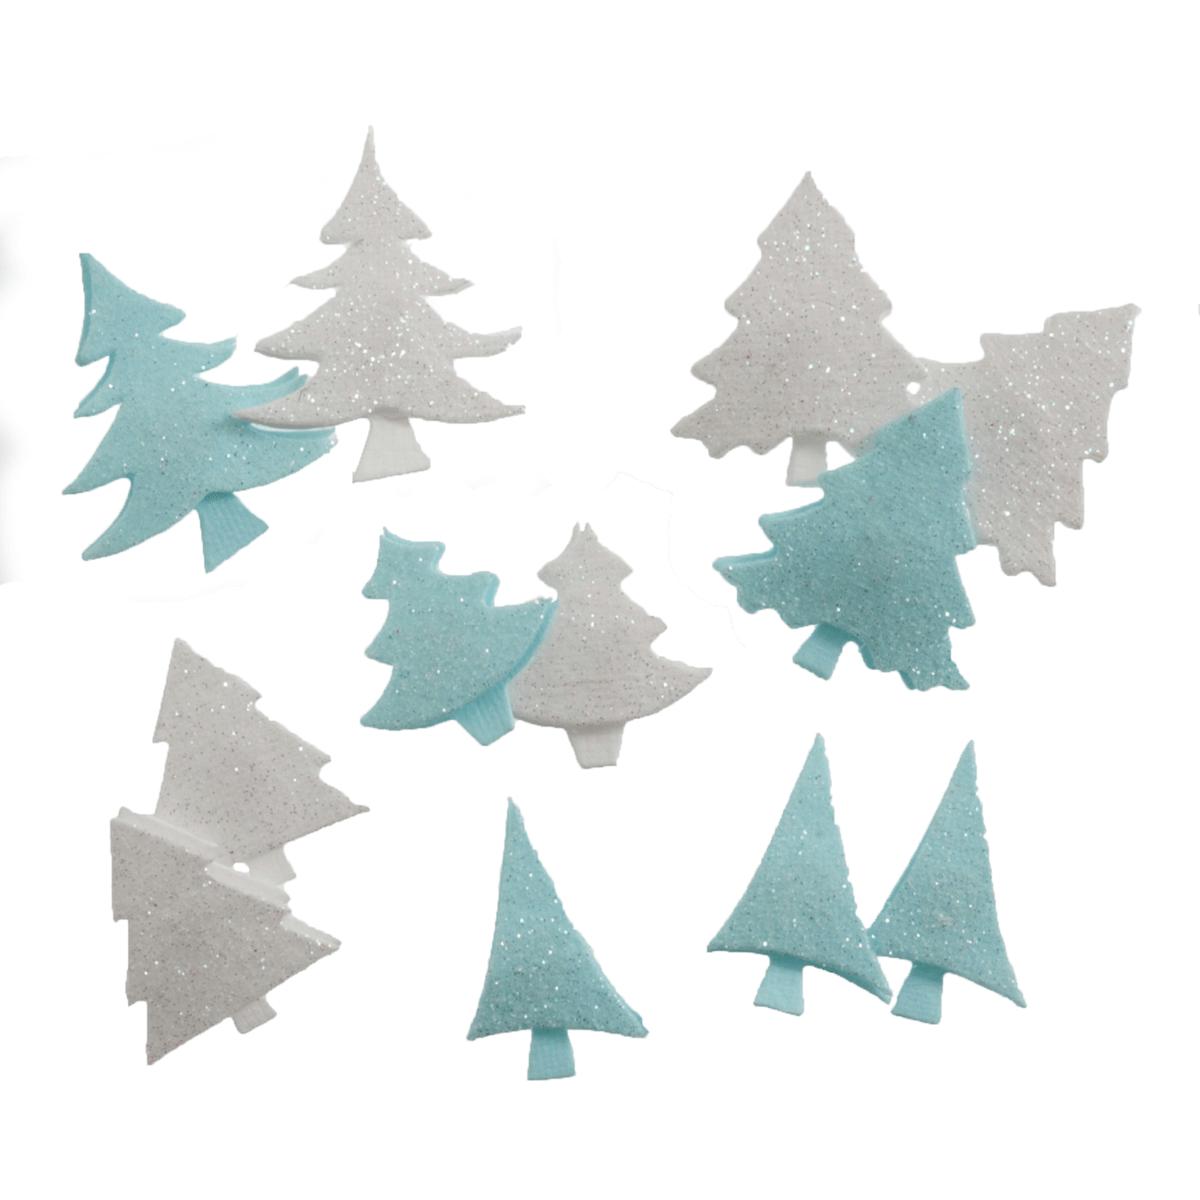 12 x Christmas 3D Mini Glitter Trees Embellishments Craft